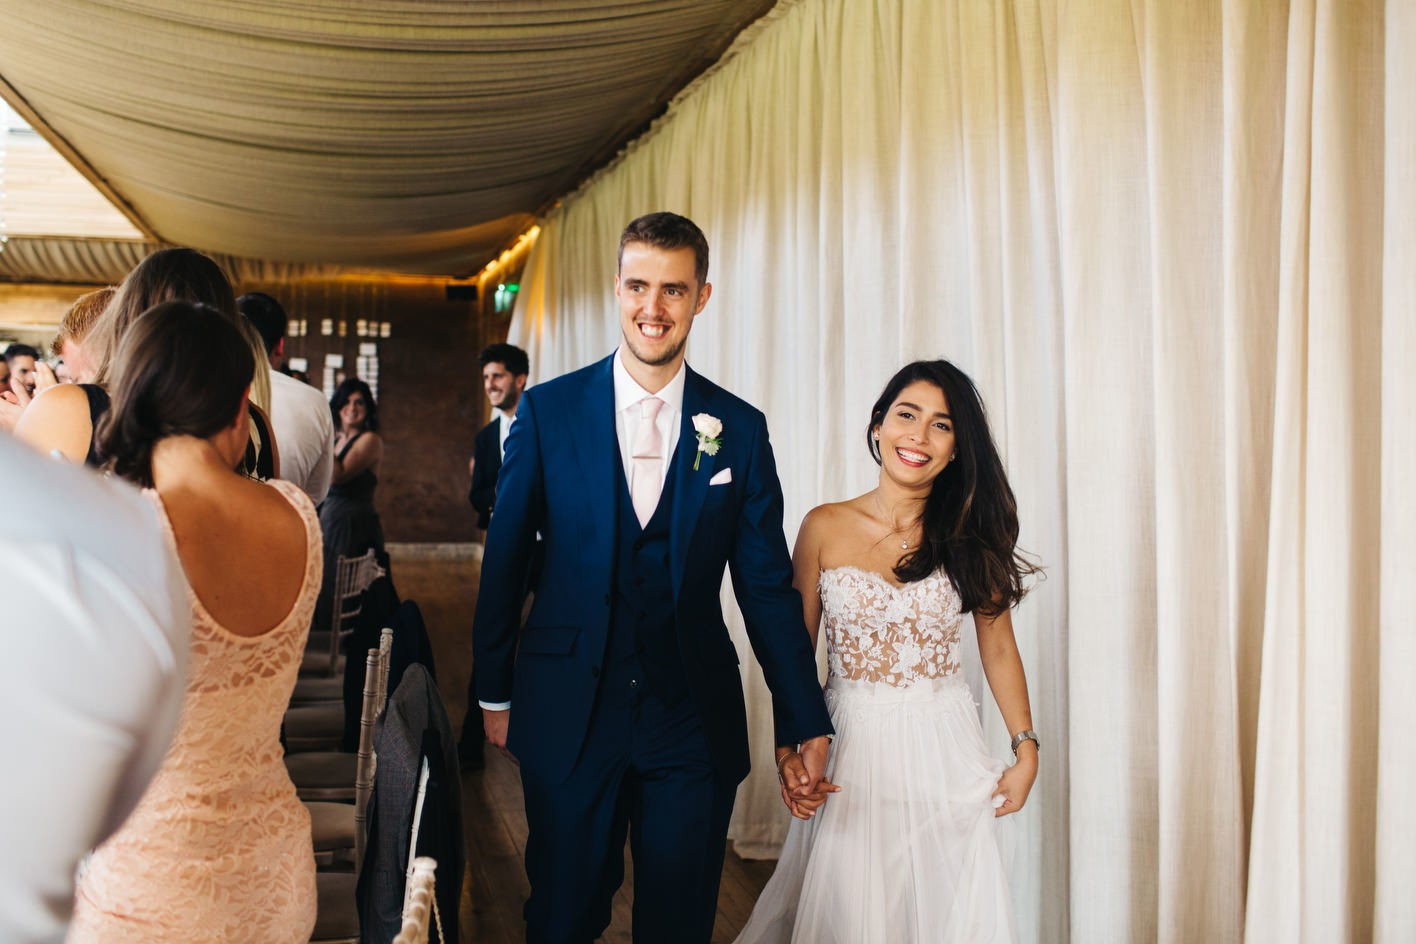 newly weds enter elmore court reception